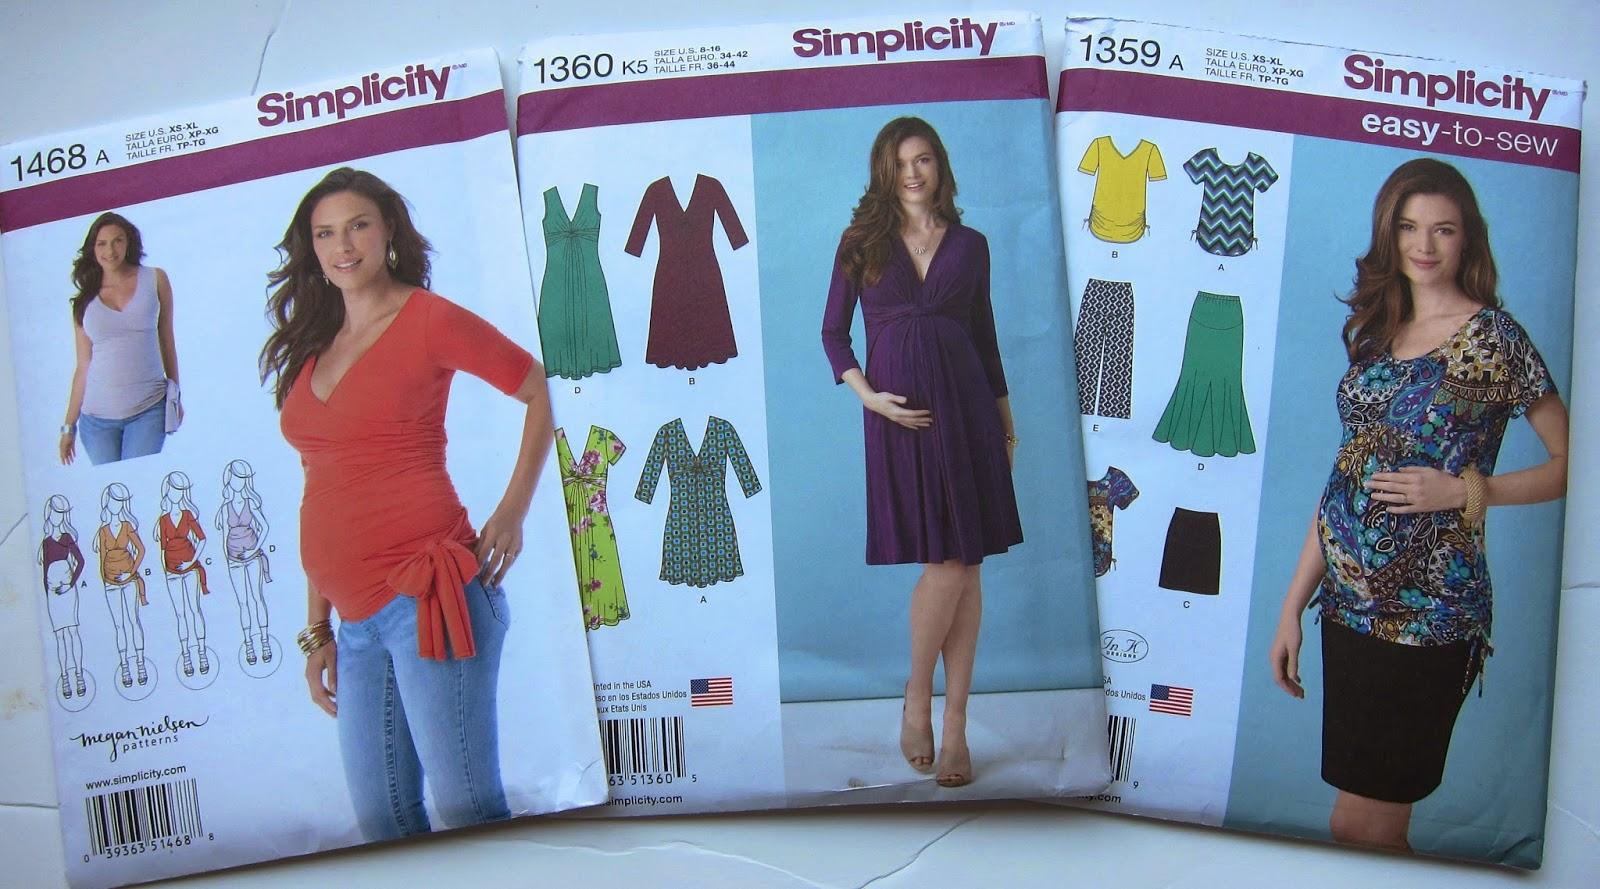 Celtic Wedding Dress Patterns To Sew 27 Lovely Next I have a